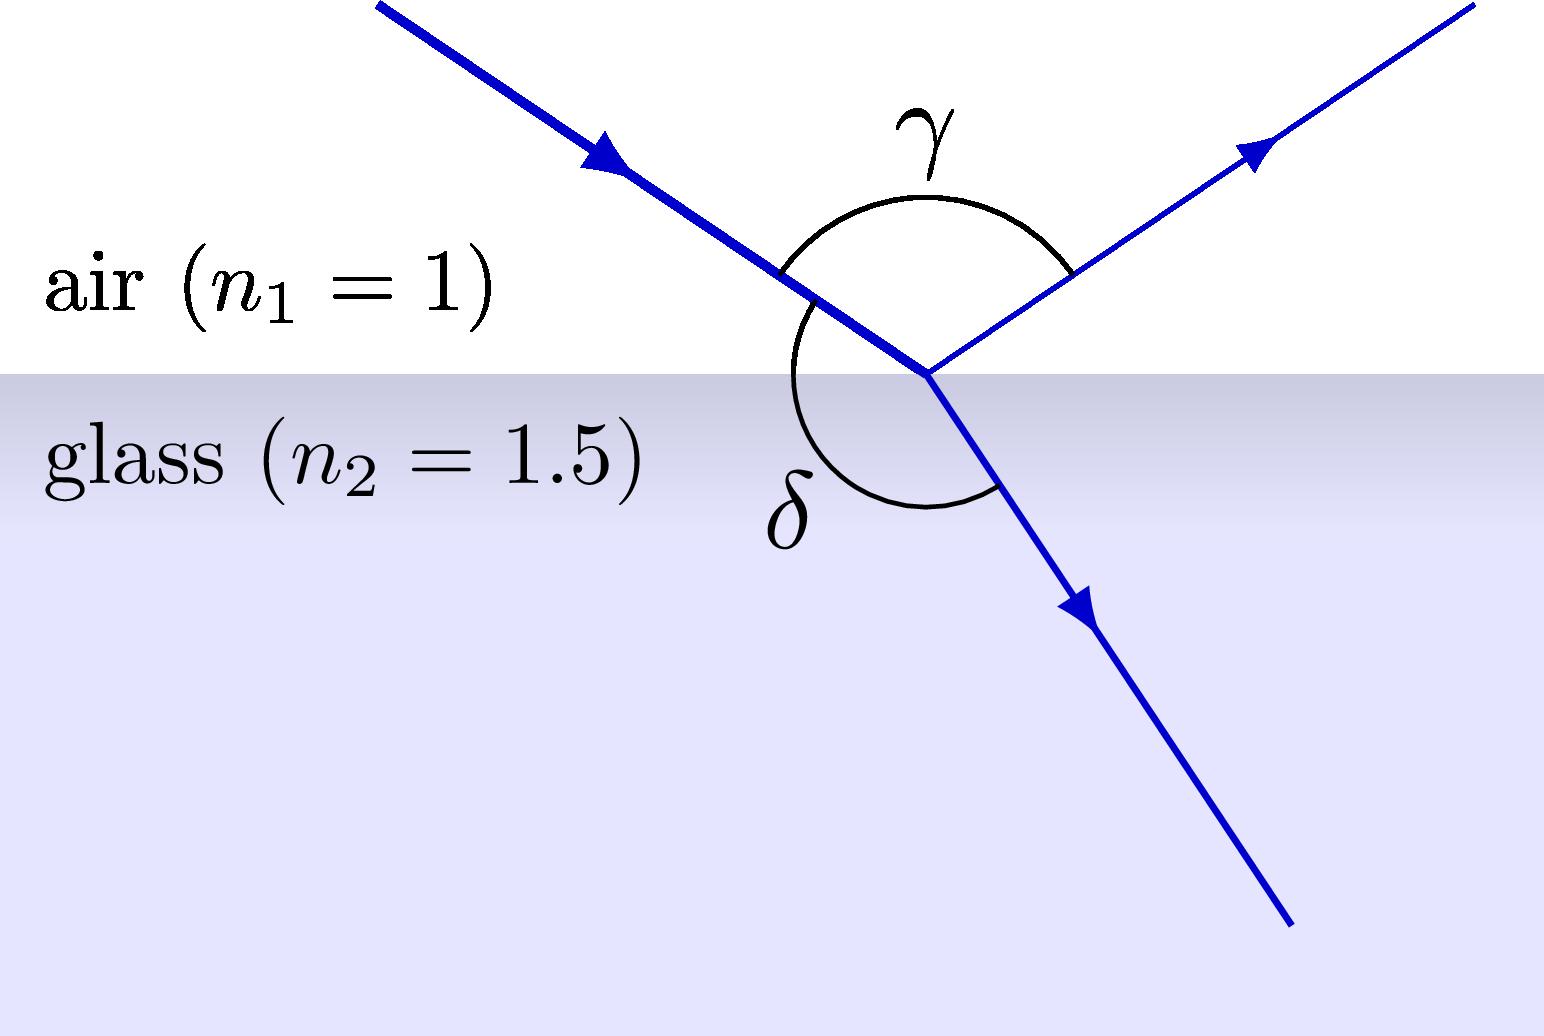 optics_refractions-006.png